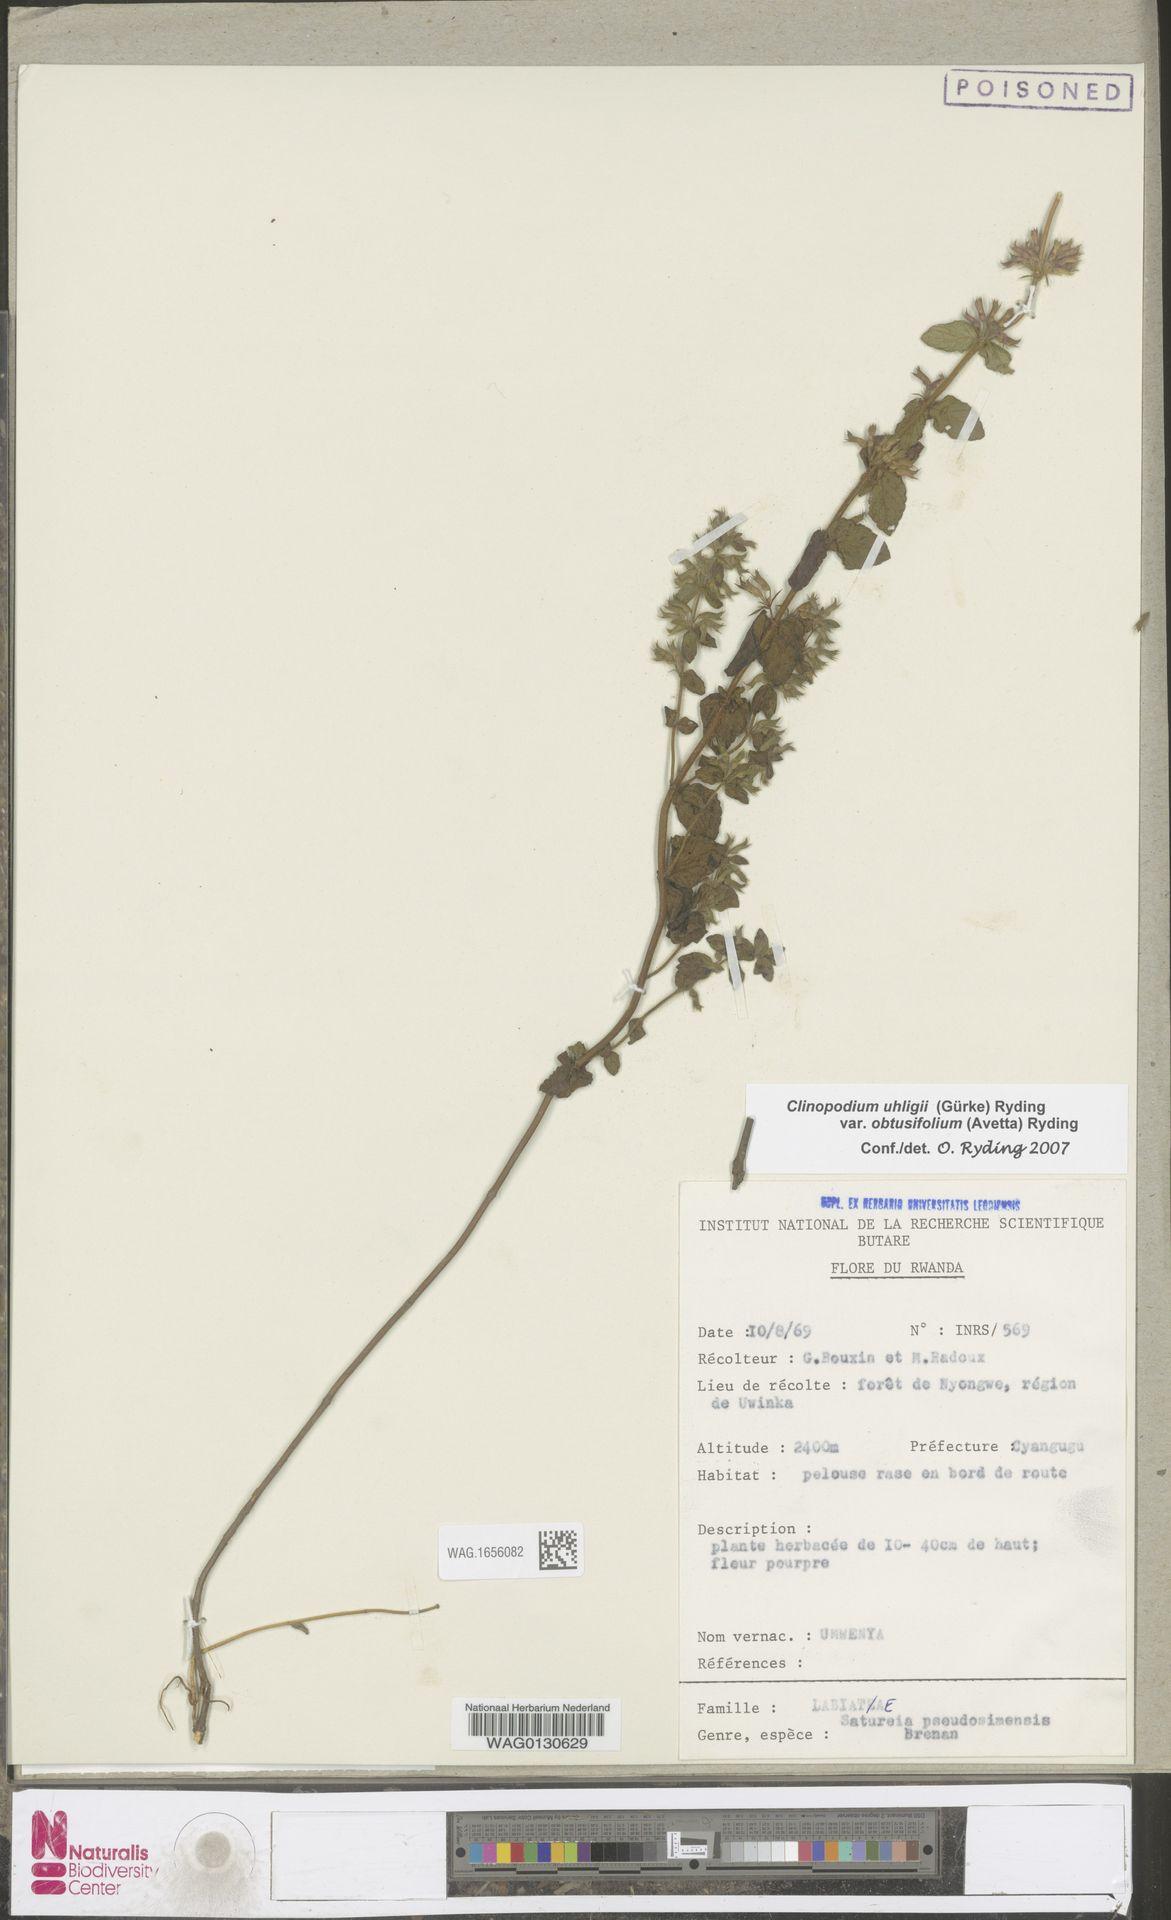 WAG.1656082 | Clinopodium uhligii var. obtusifolium (Avetta) Ryding